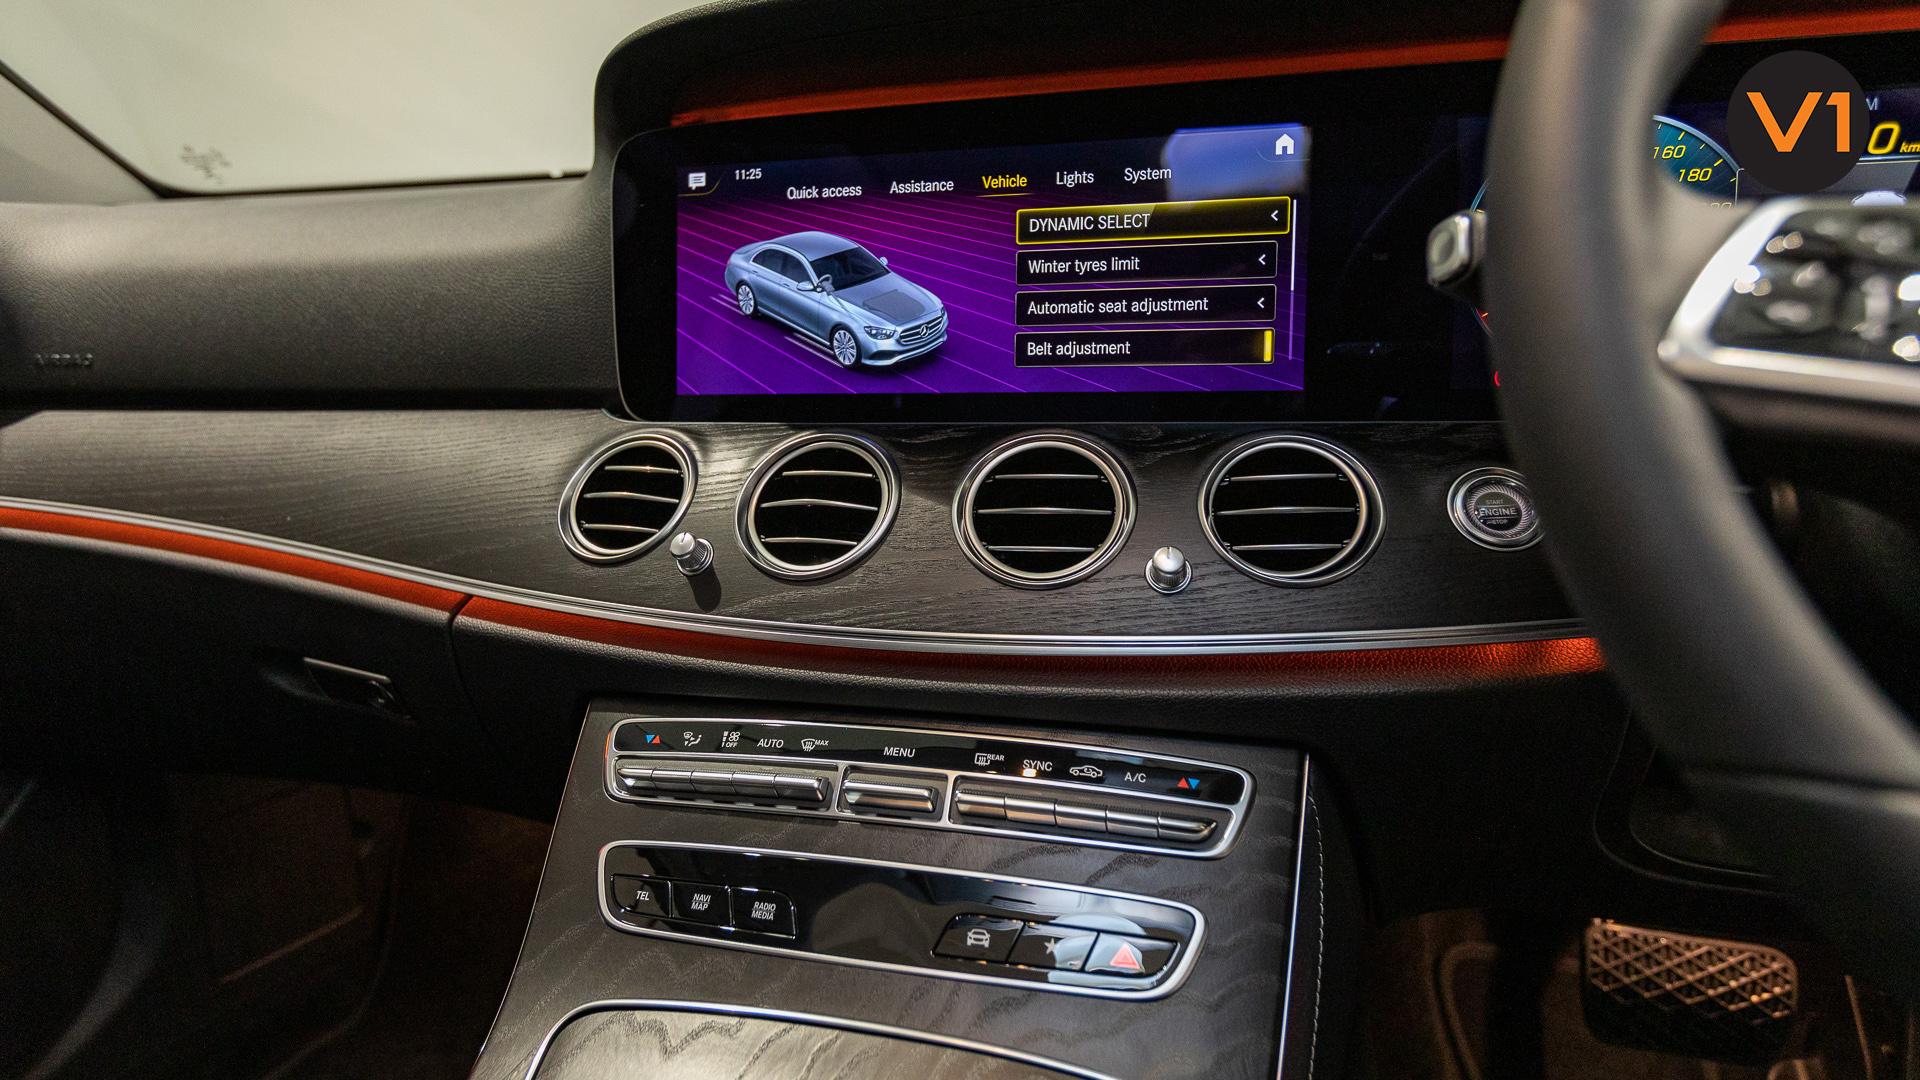 Mercedes-Benz E200 Saloon AMG Luxury (FL2021) - HVAC System